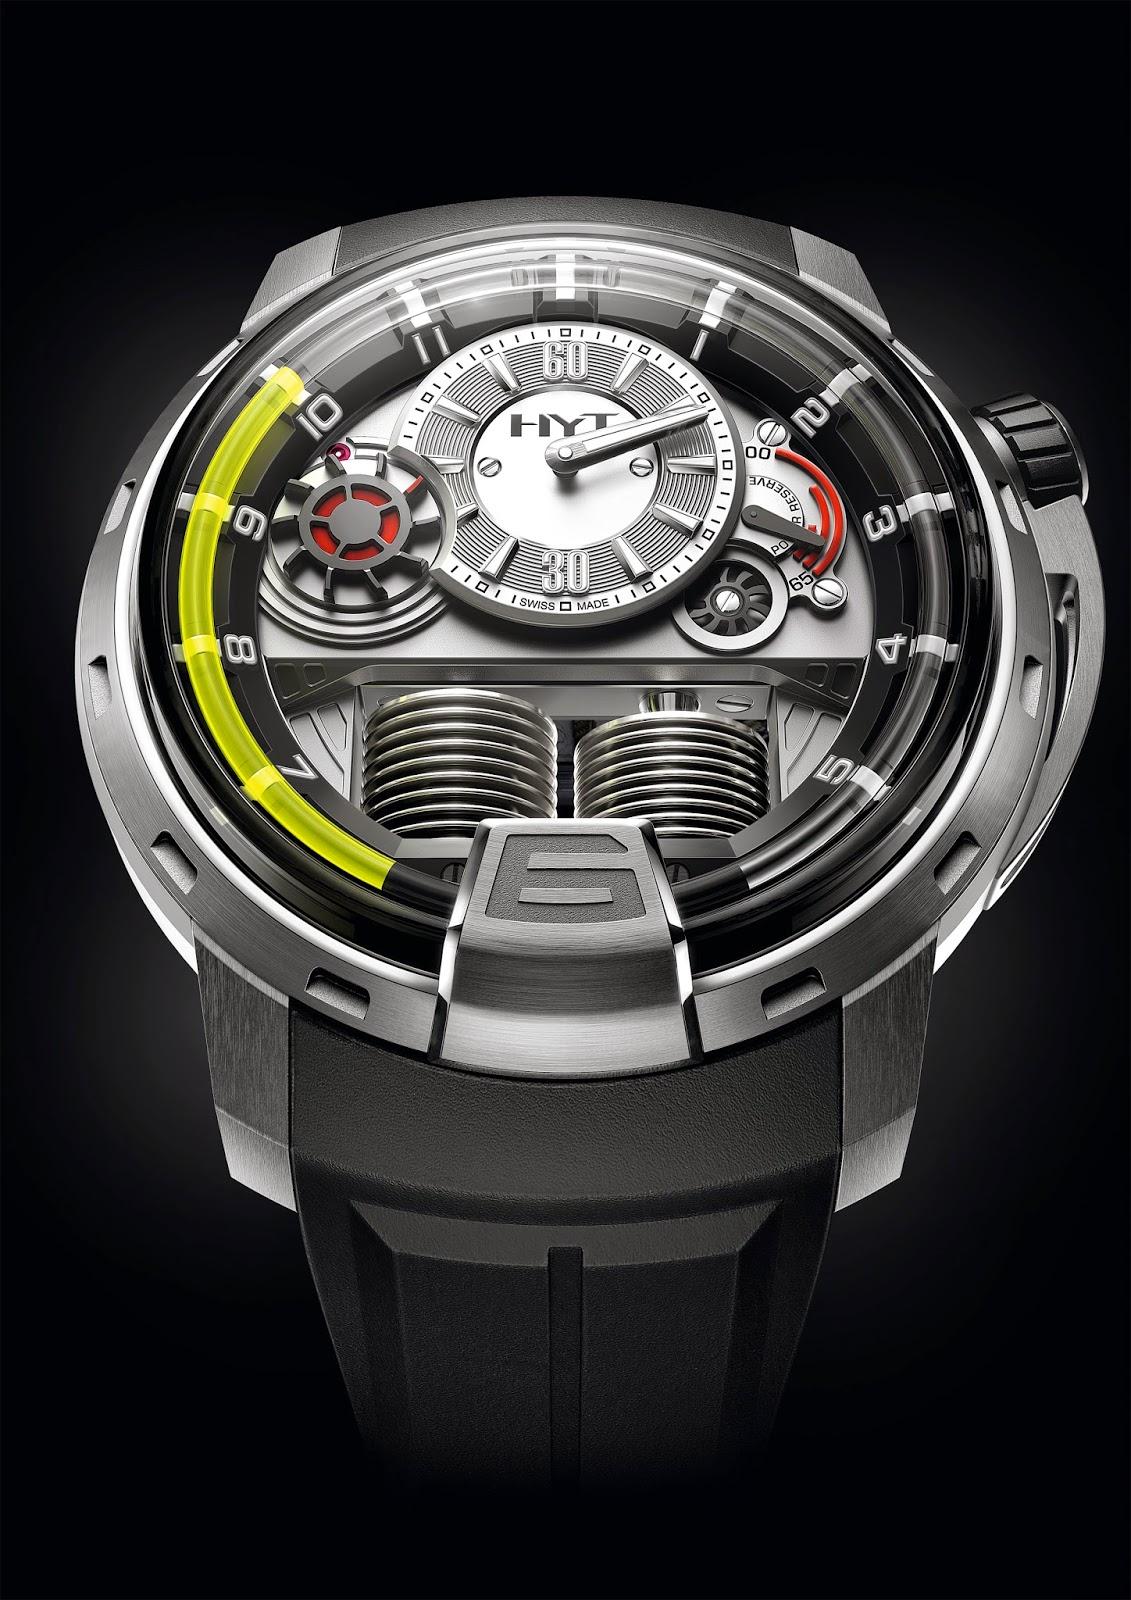 HYT watch3